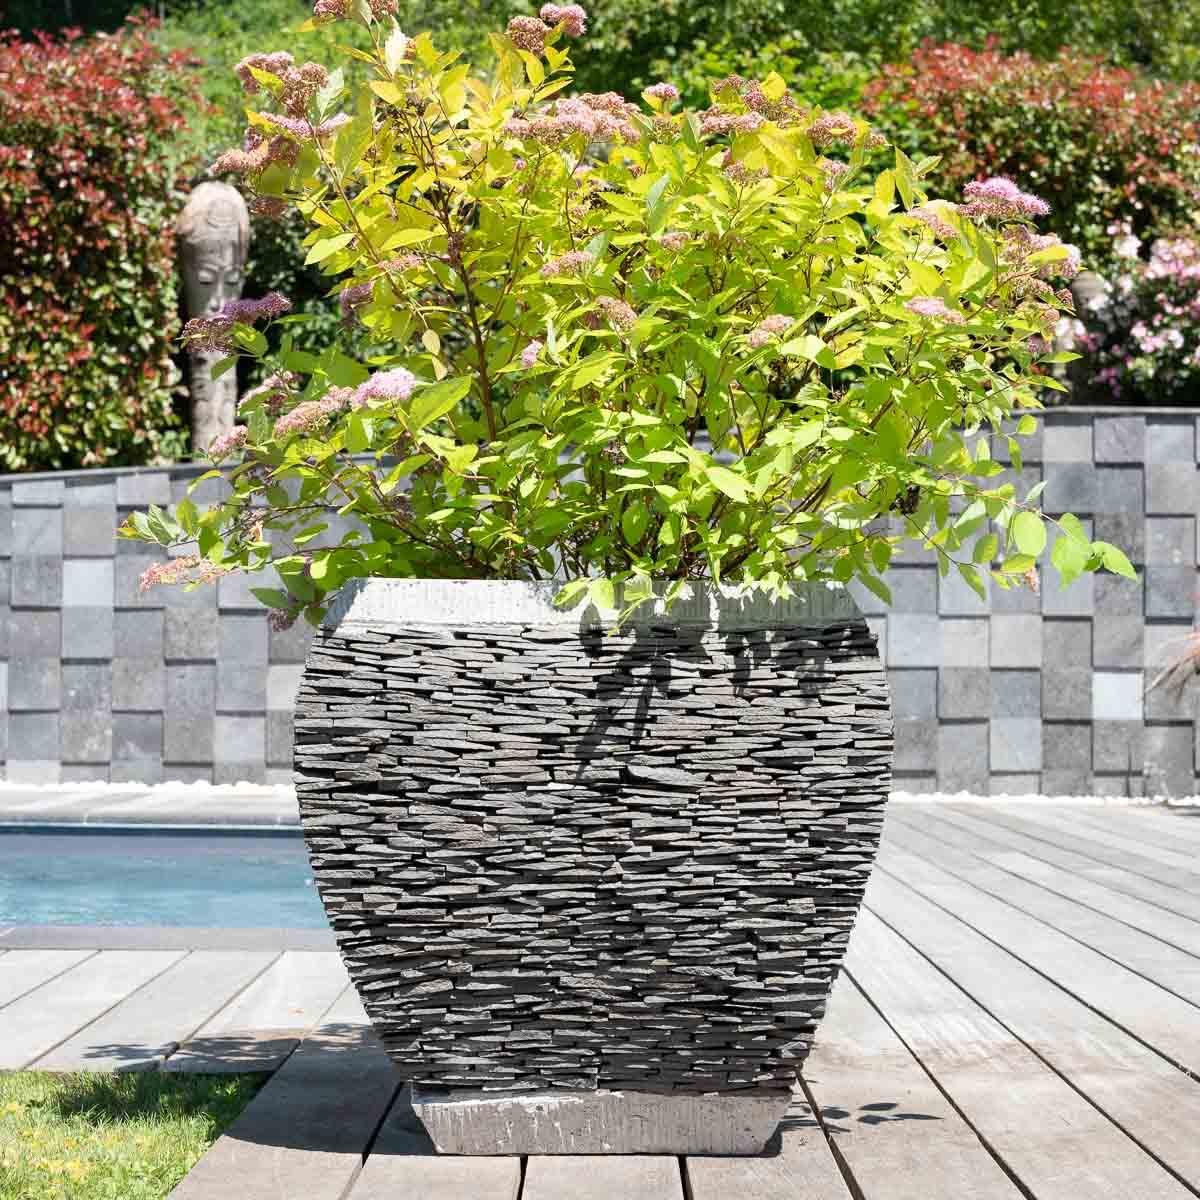 Wanda Collection Pot bac jardinière galbé ardoise 50 cm jardin pierre naturelle